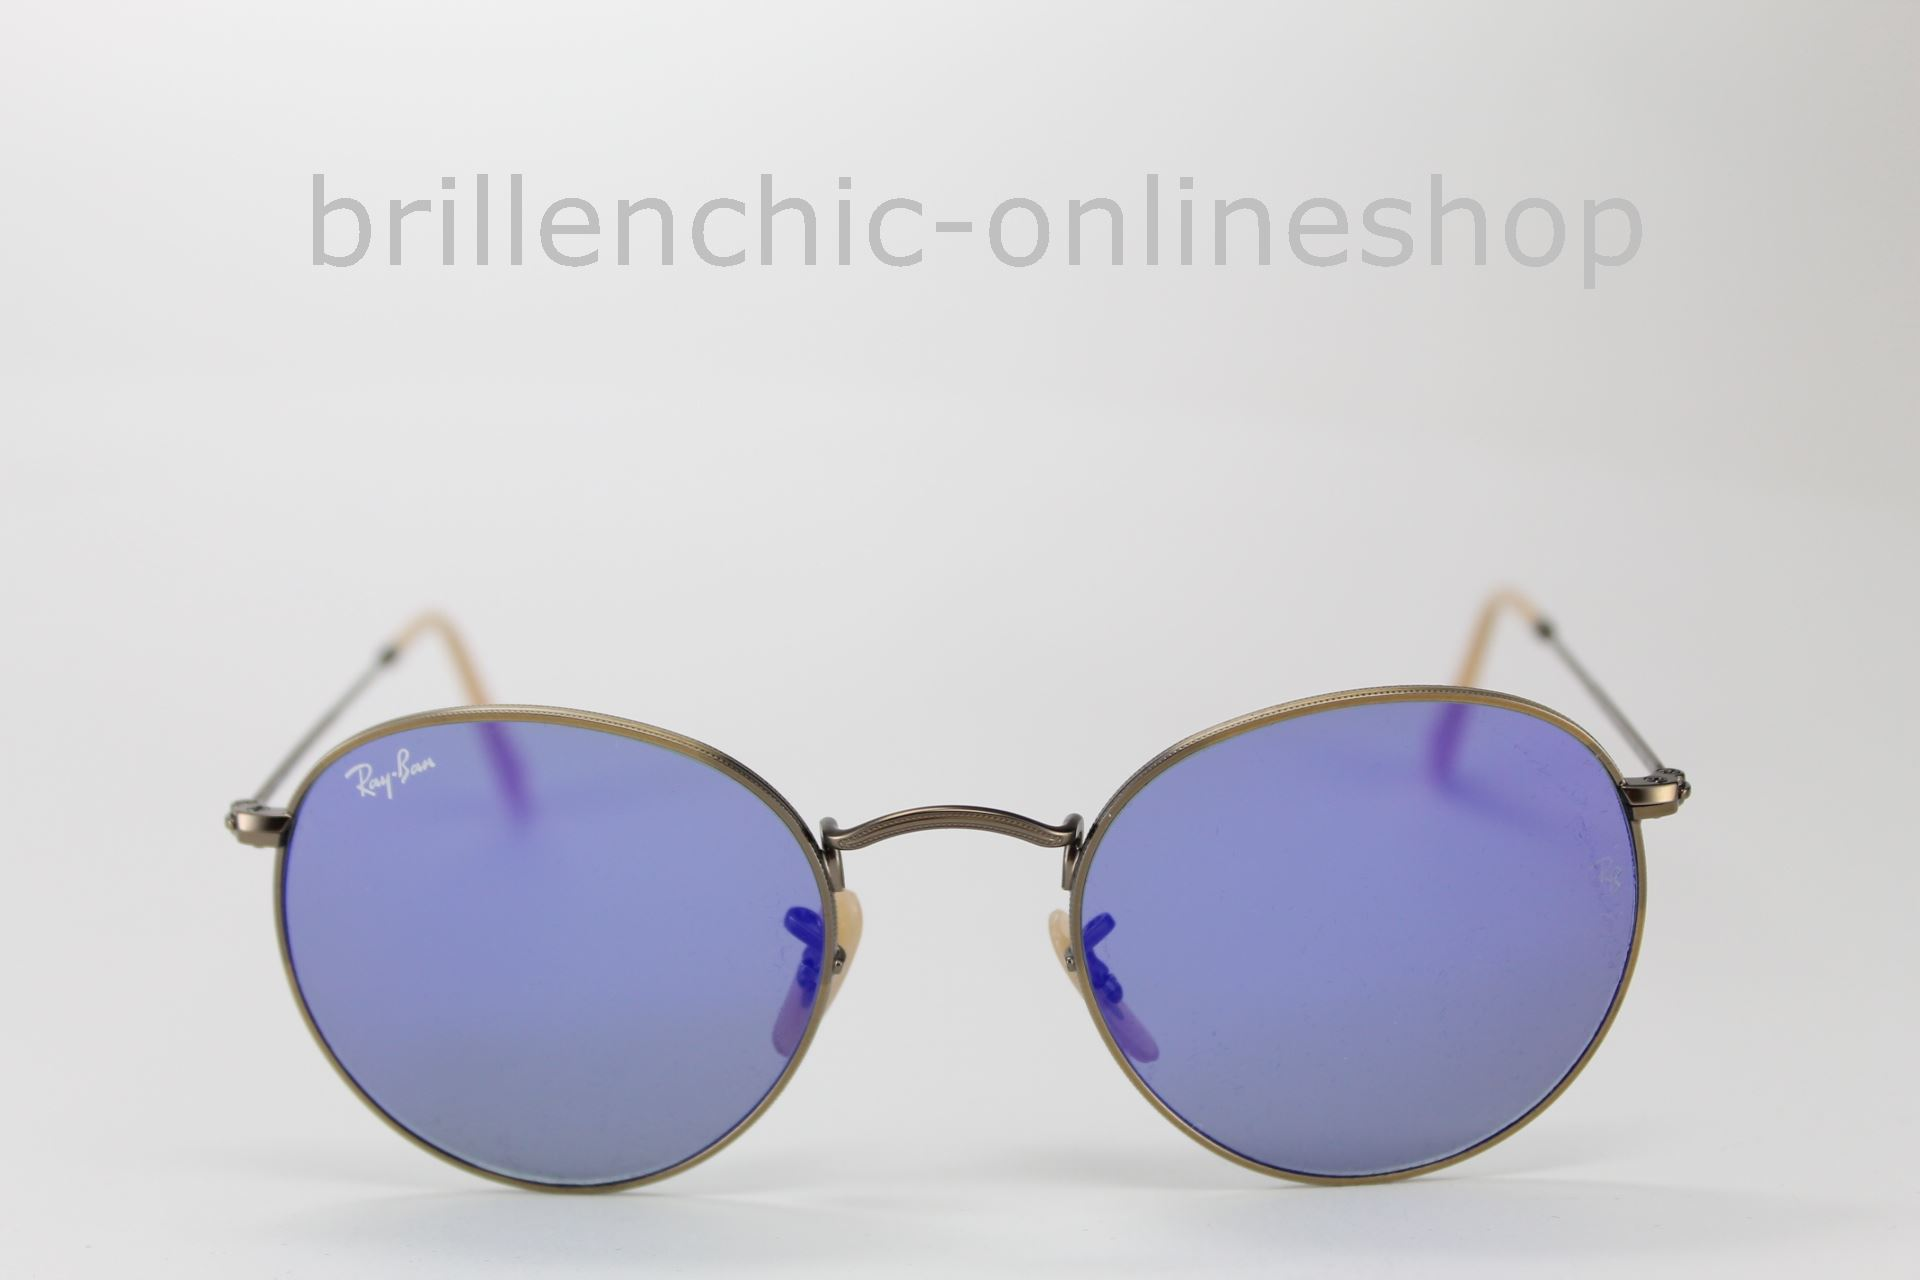 f07de5786 Brillenchic-onlineshop in Berlin - Ray Ban ROUND METAL RB 3447 167/68